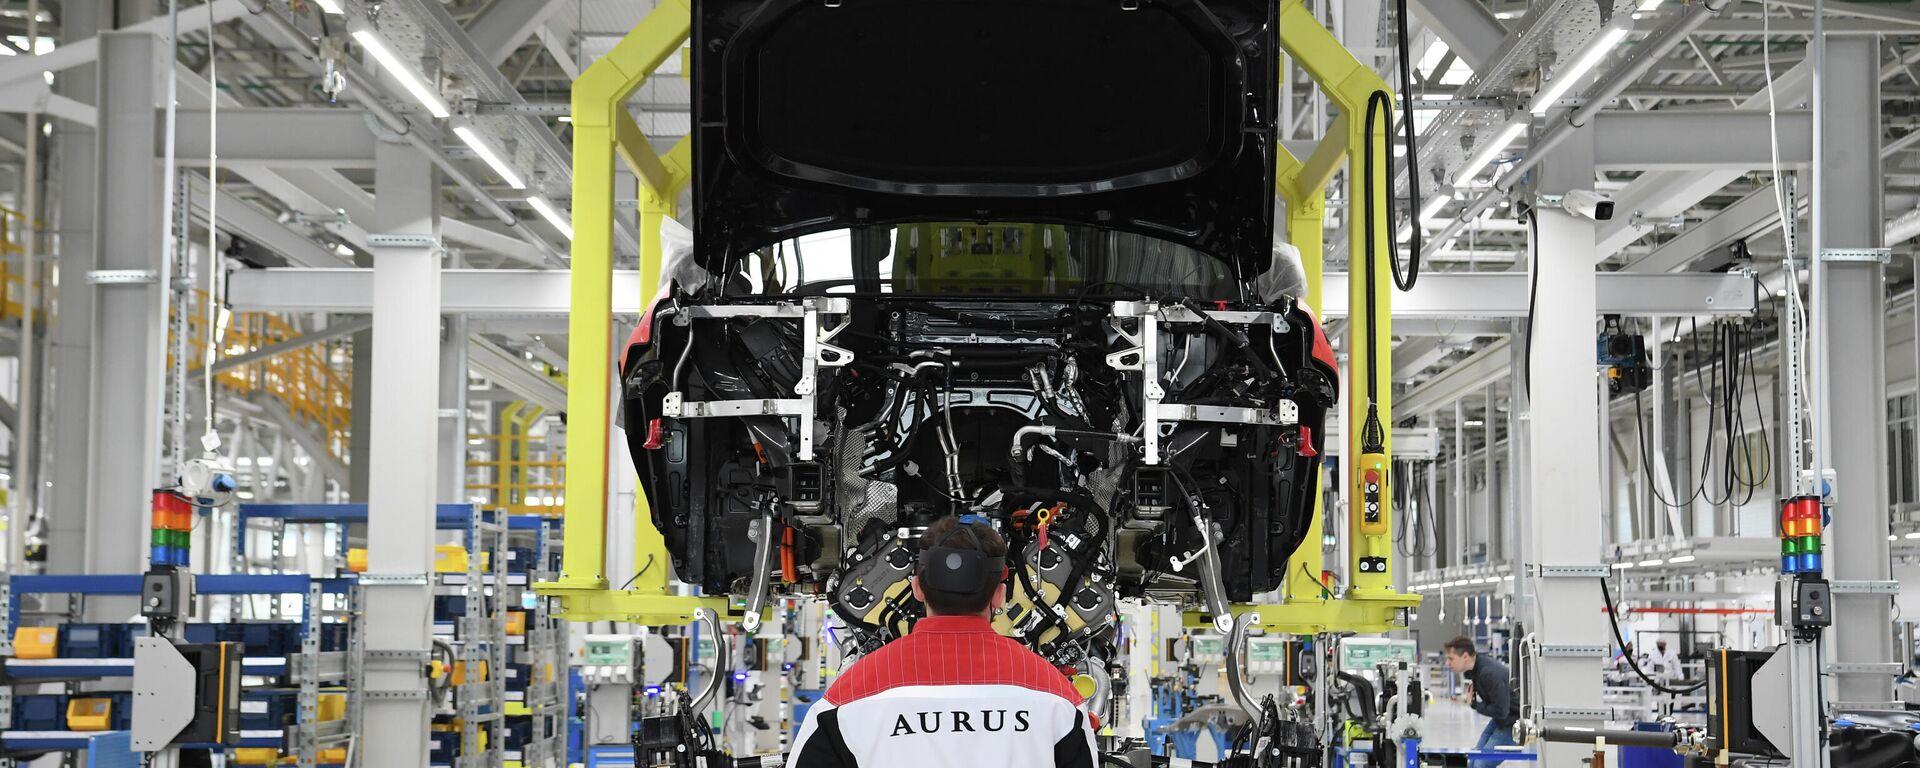 Fábrica de automóviles Aurus en Rusa - Sputnik Mundo, 1920, 02.06.2021